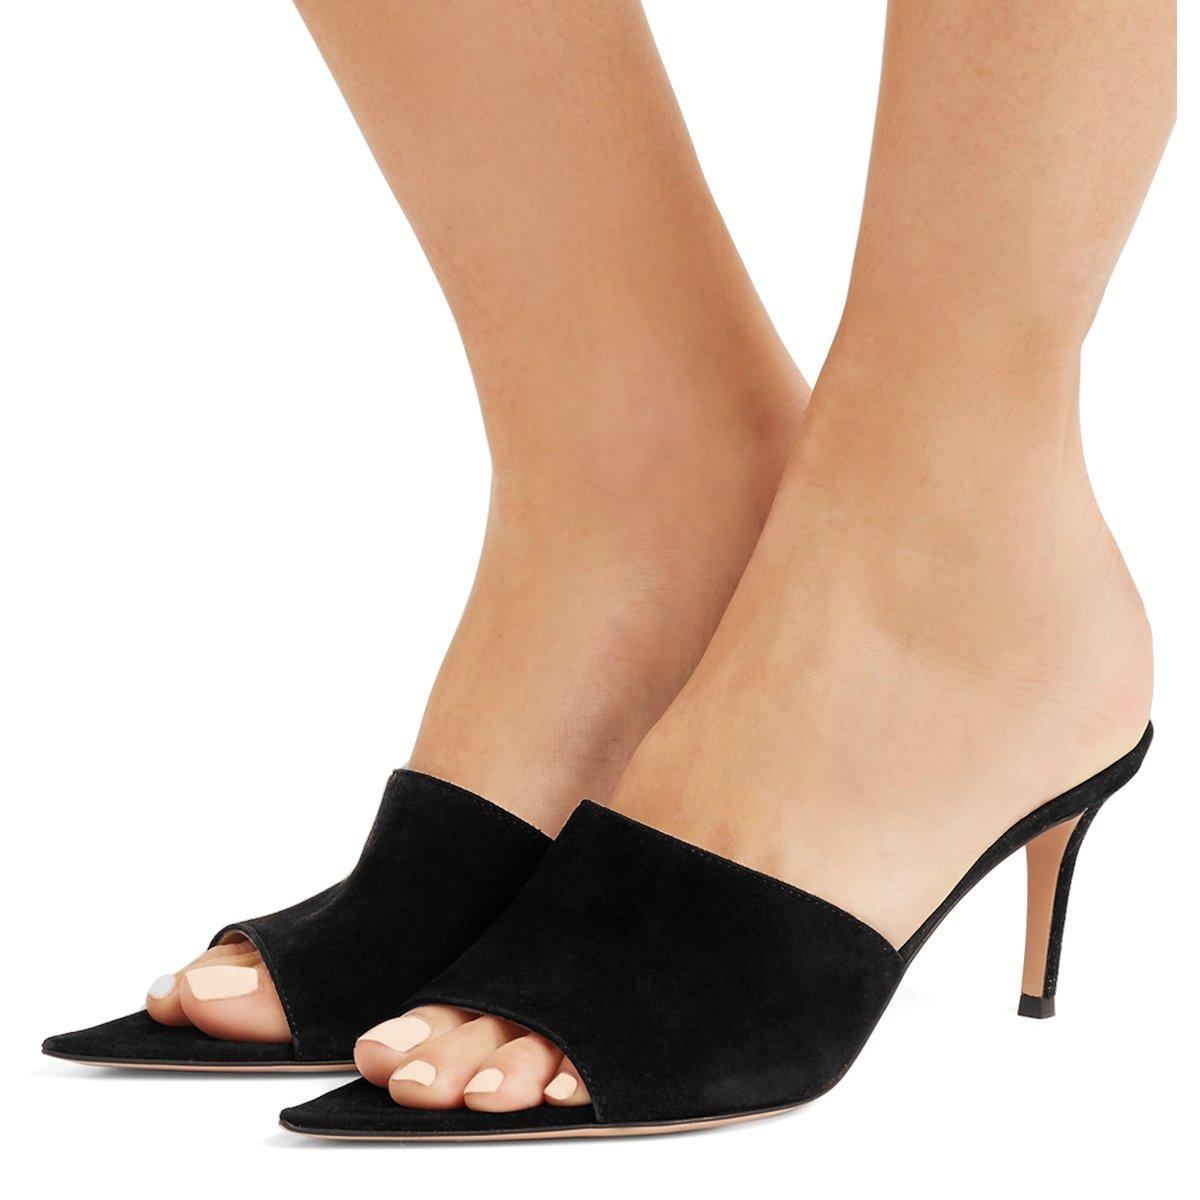 FSJ Women Fashion Mid High Heels Sandals Suede Slip on Open Toe Mules Sexy Slide Shoes Size 11 Black-7 cm